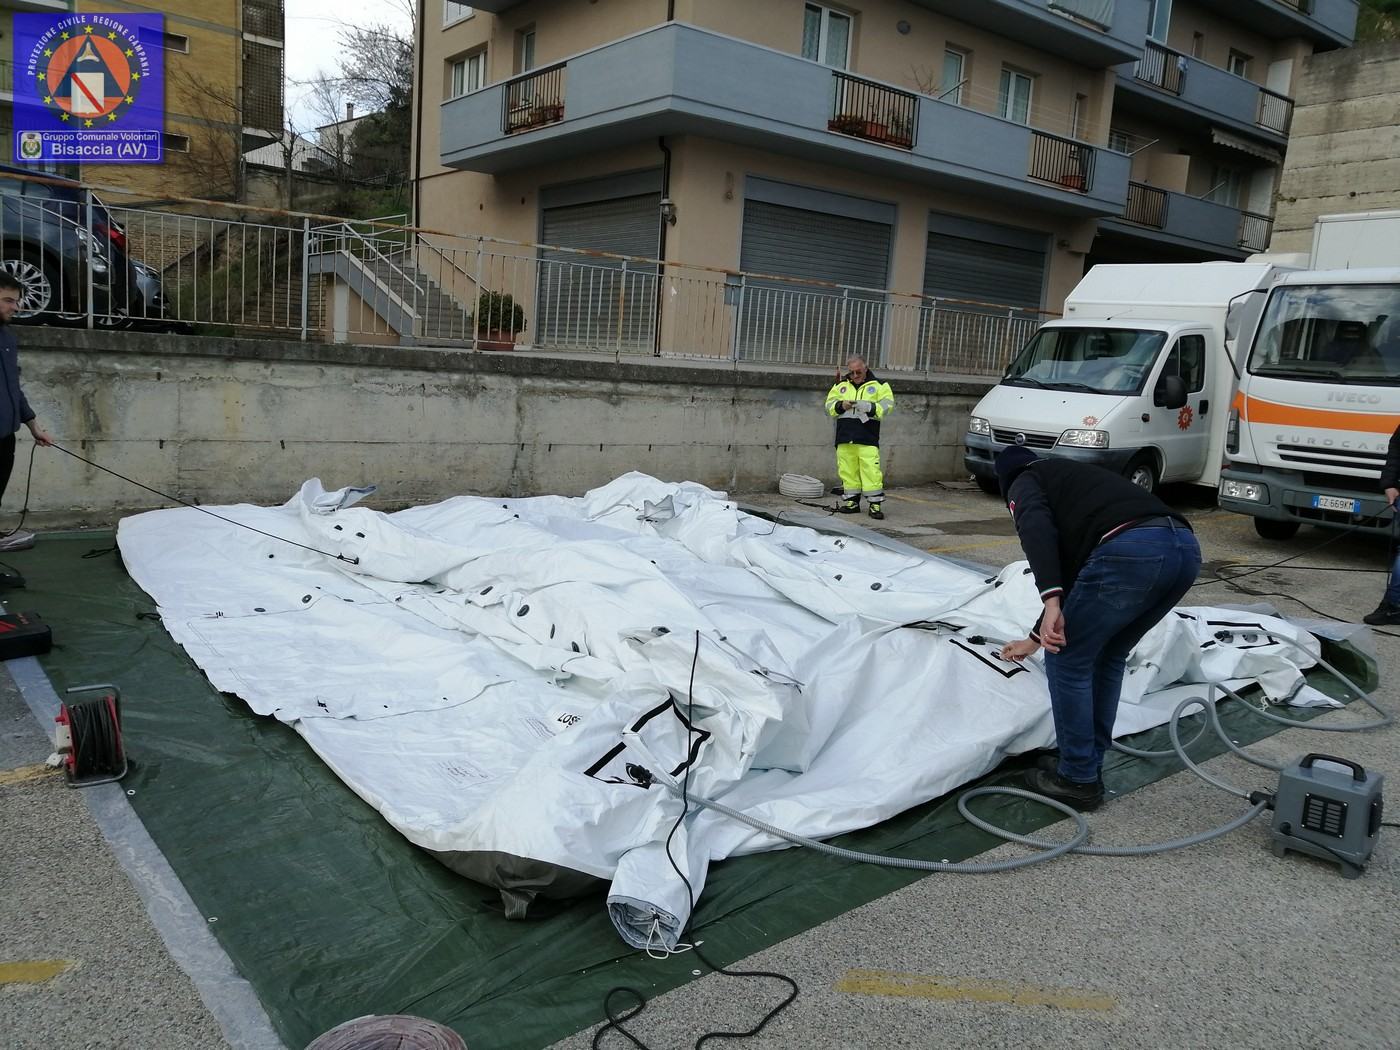 Tenda Ariano GCVPC Bisaccia 1